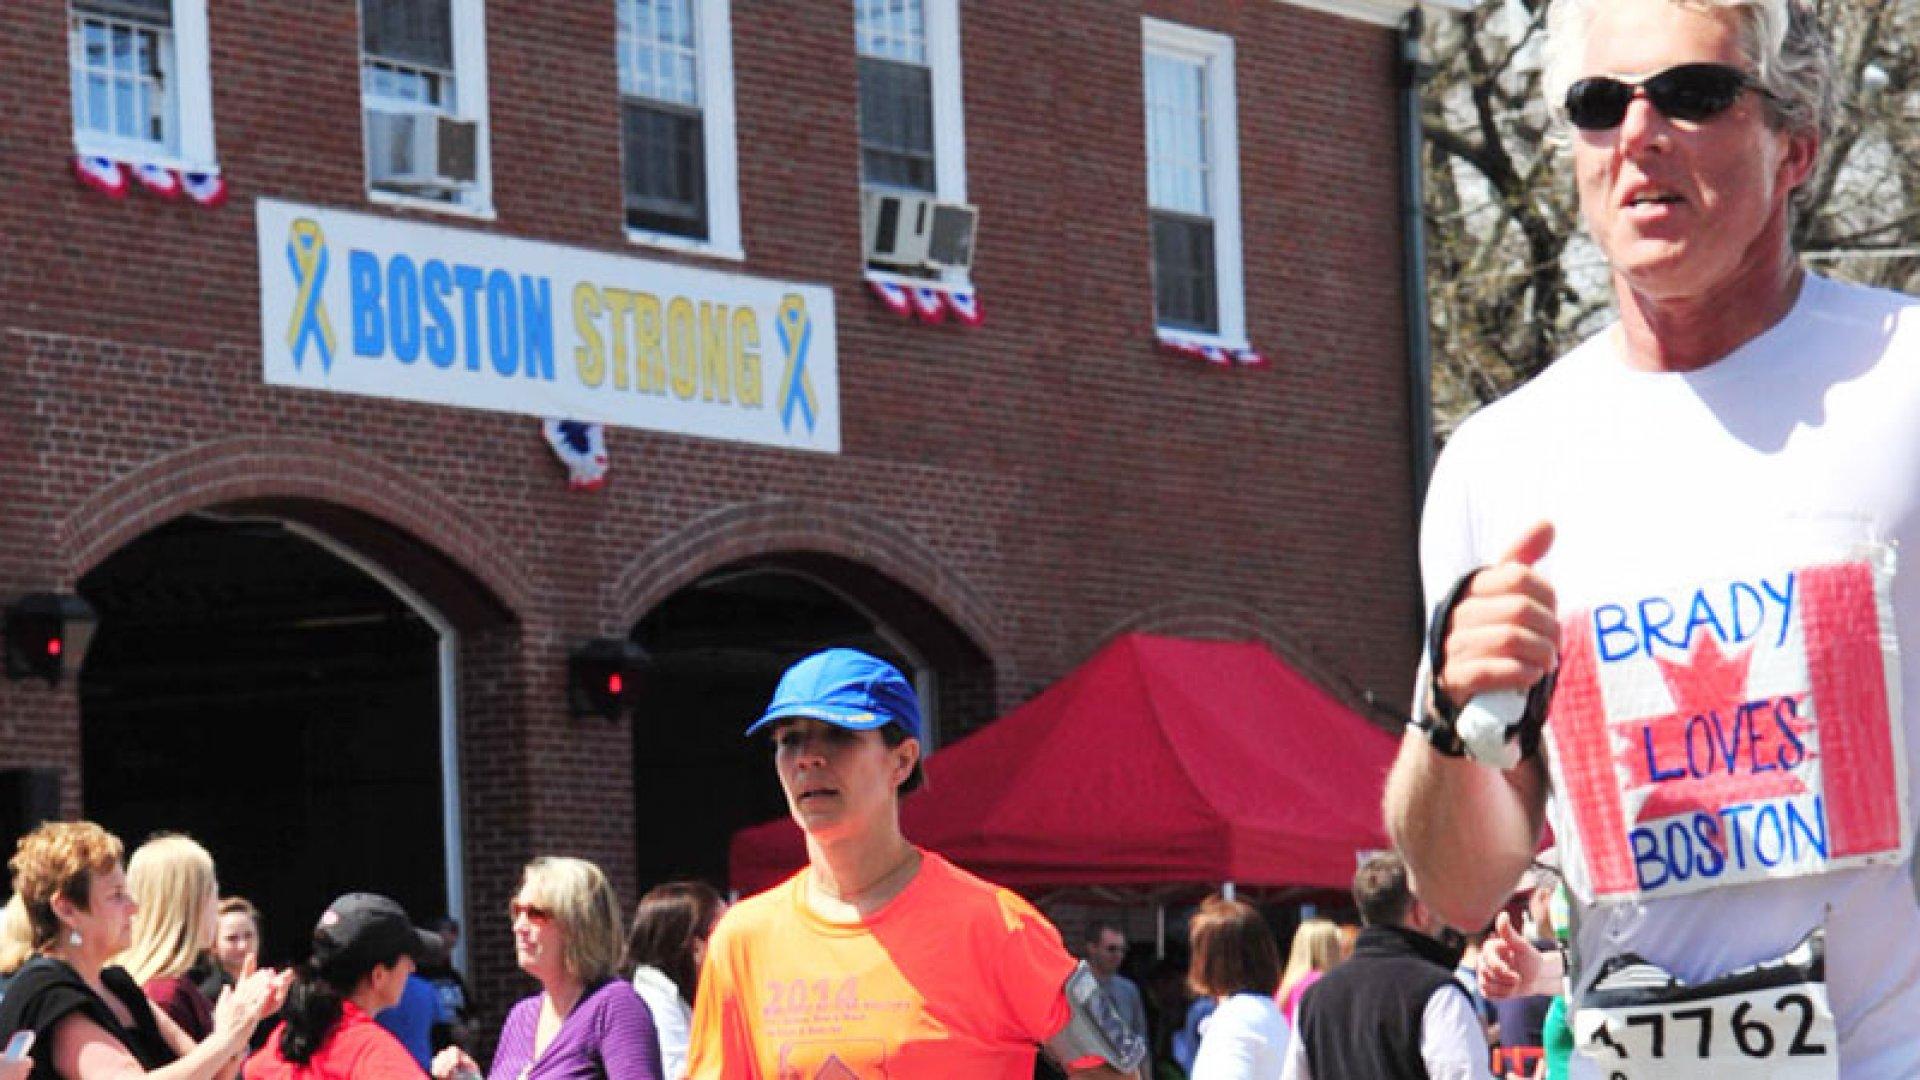 Want to Win? Run Your Business Like The Boston Marathon